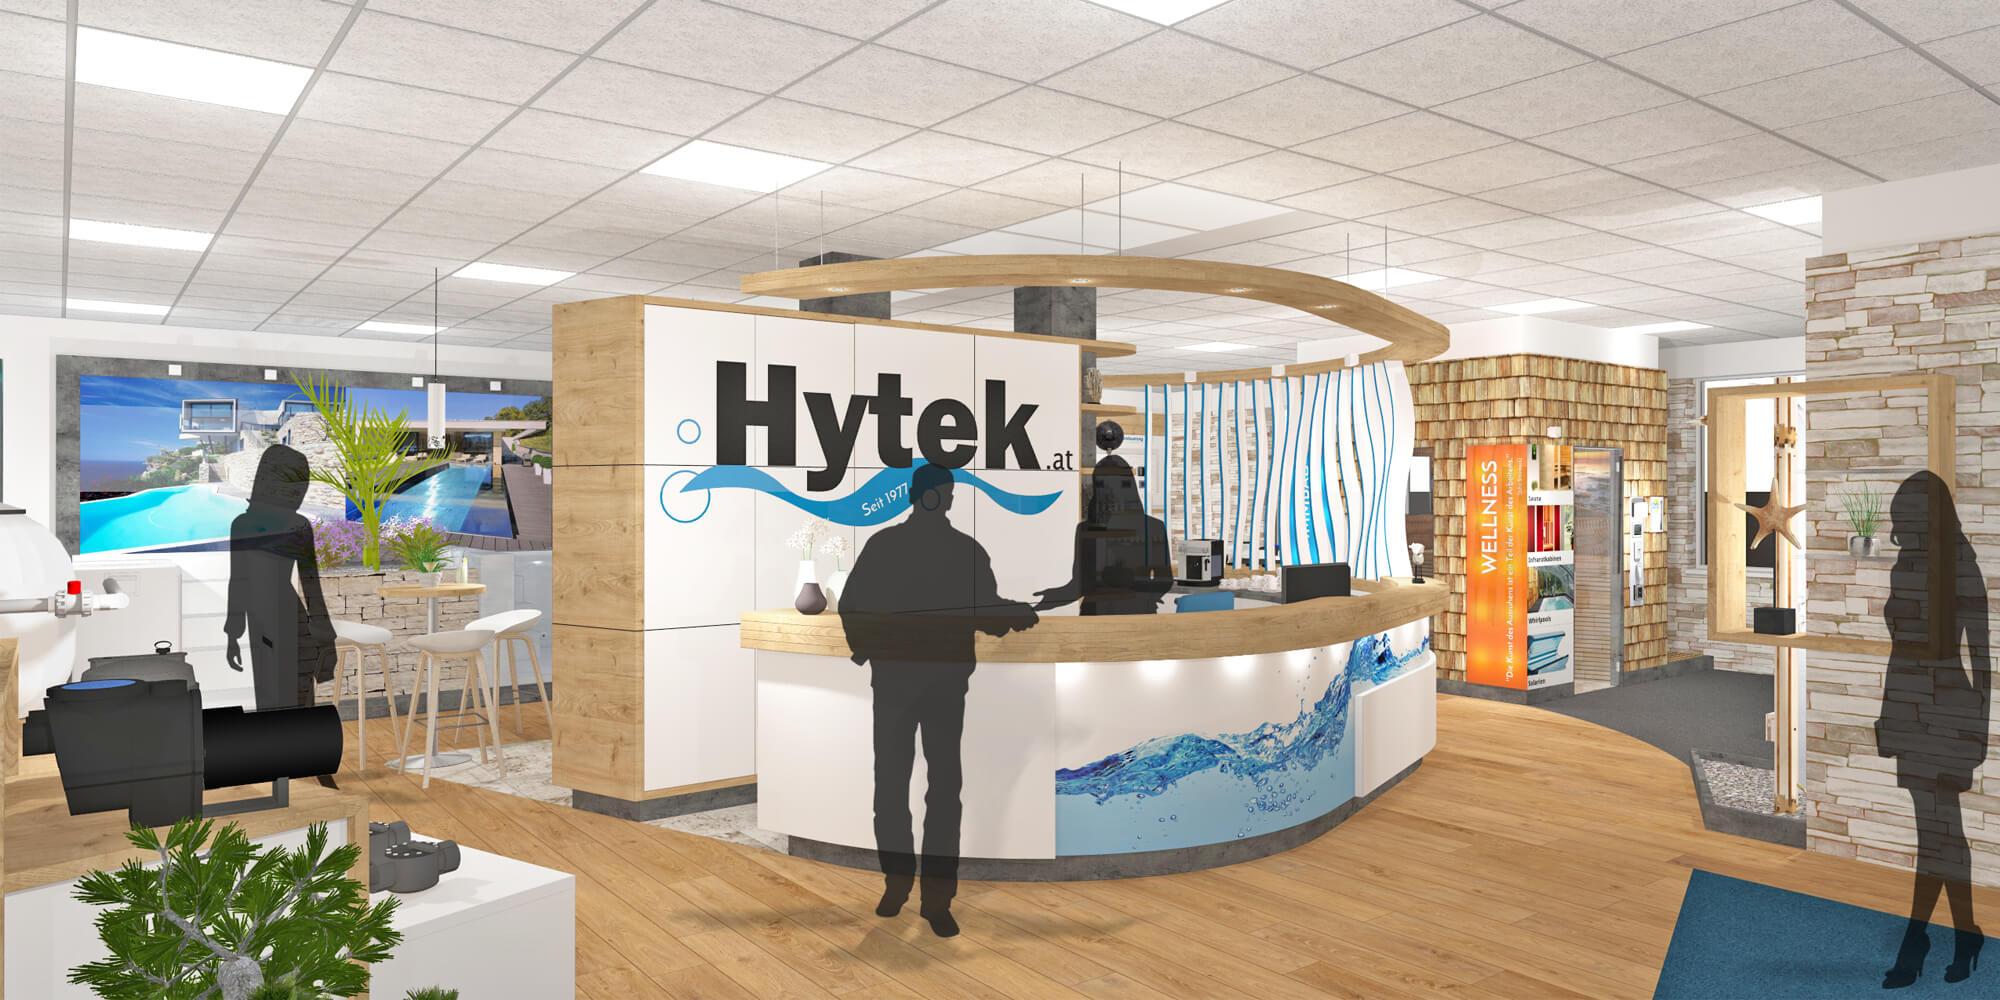 Cre-Plan-Design-Architektur-Innenarchitektur-Design-Projekt-Referenz-Hytek-05